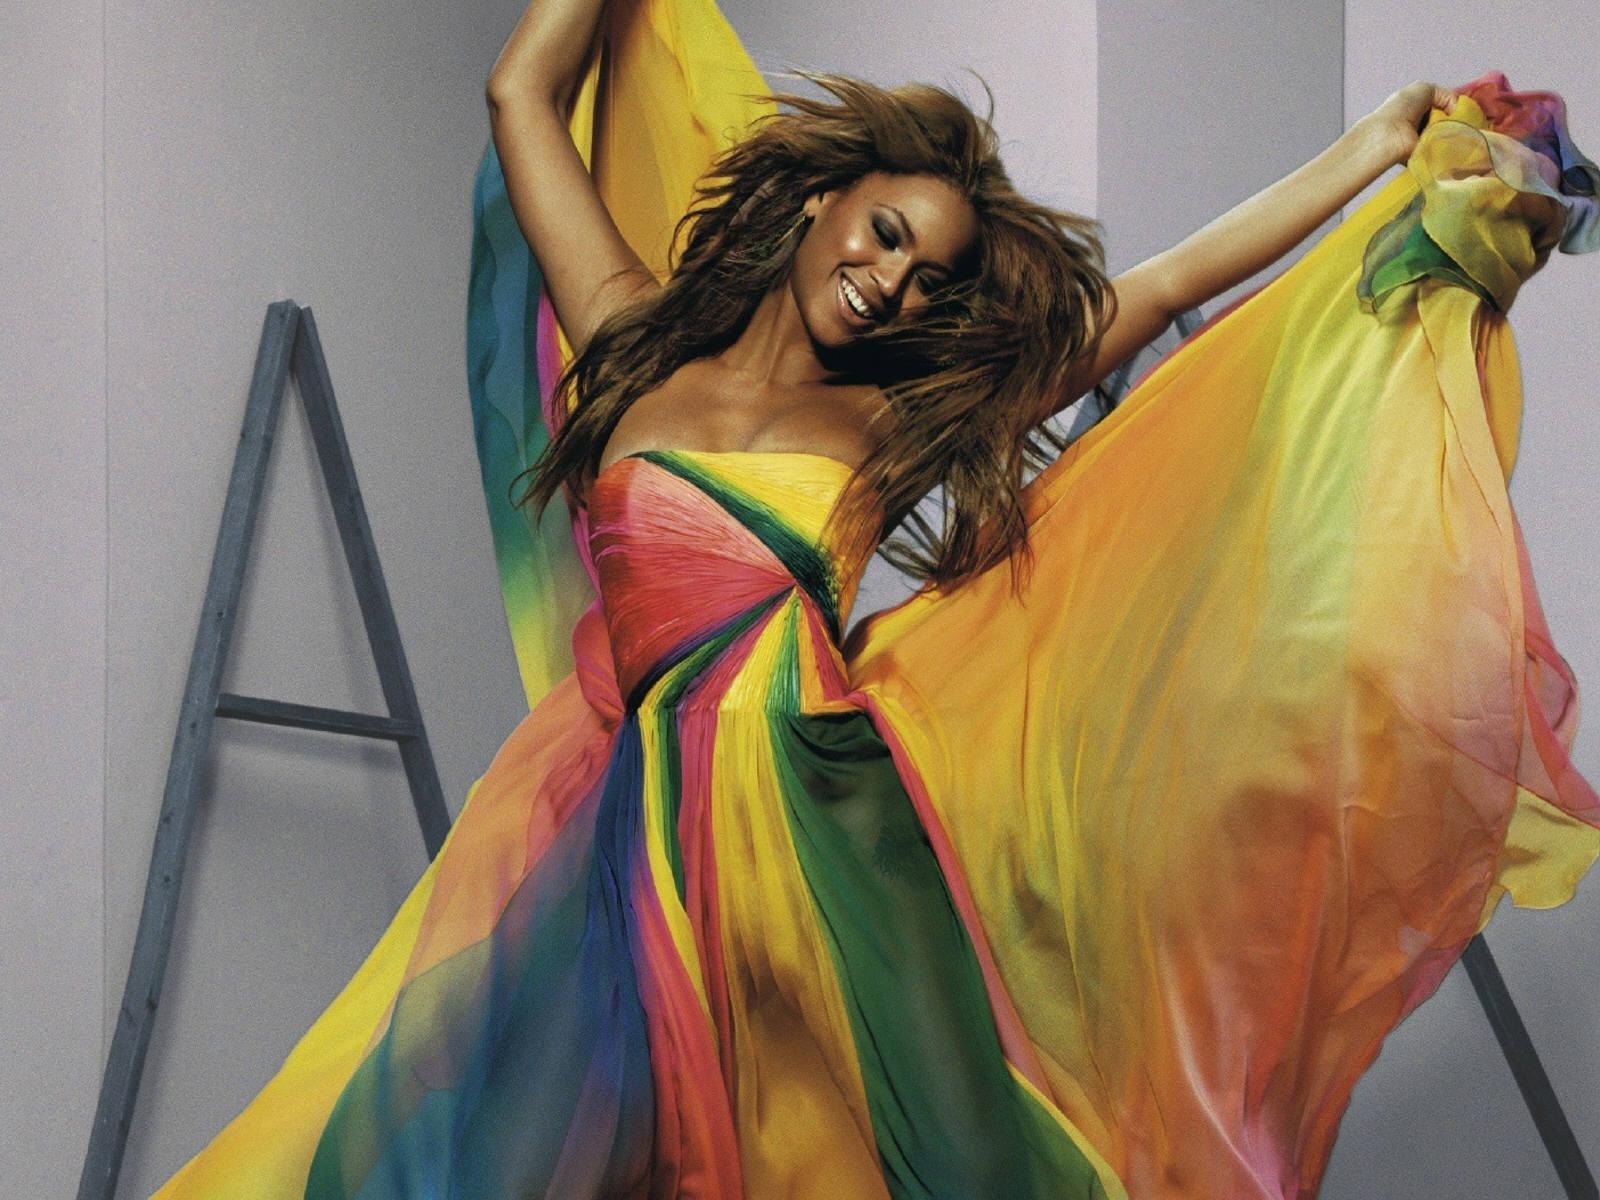 http://1.bp.blogspot.com/-qsAMGoY7D5Y/UCPW5zA9kGI/AAAAAAAAQ9Y/SQ1yBy-3n90/s1600/Beyonce+new+pic+2012+10.jpg